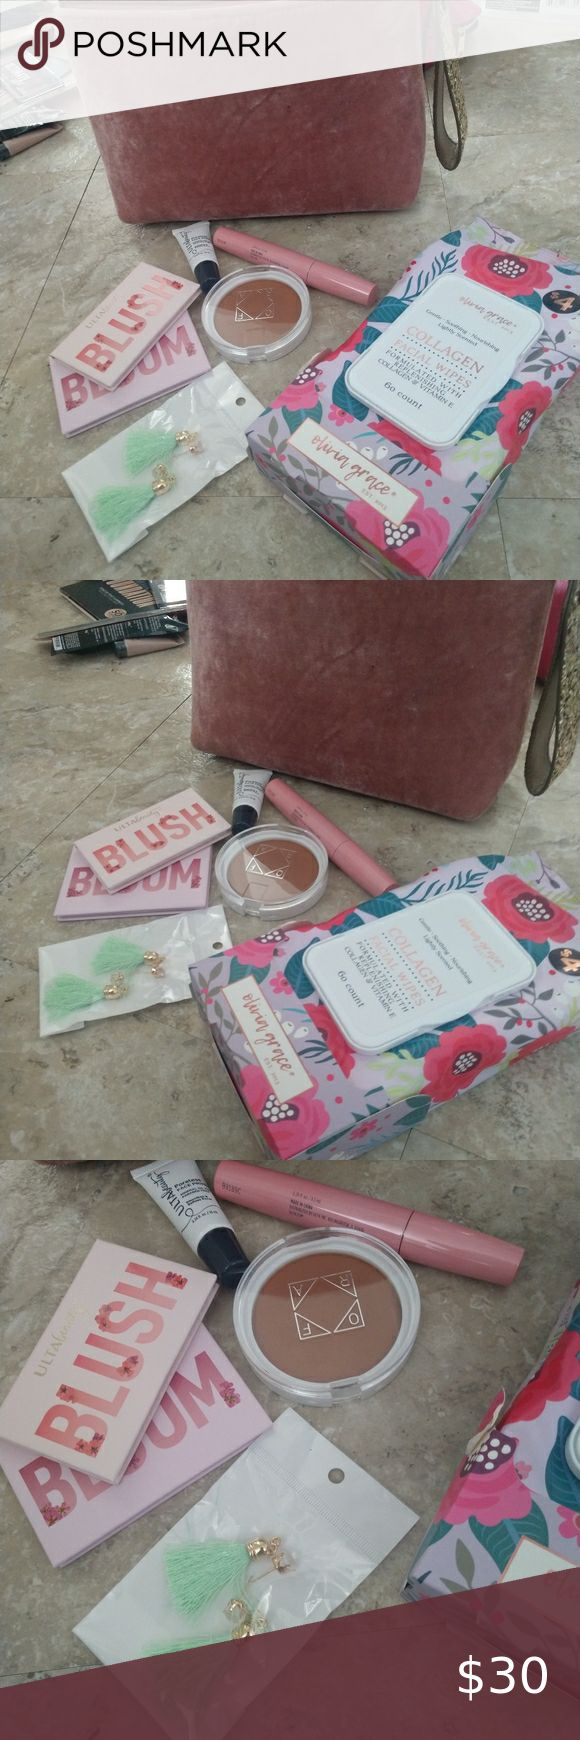 NWT Makeup Set Ulta Blush,bronzer,eyeshadow,primer This is